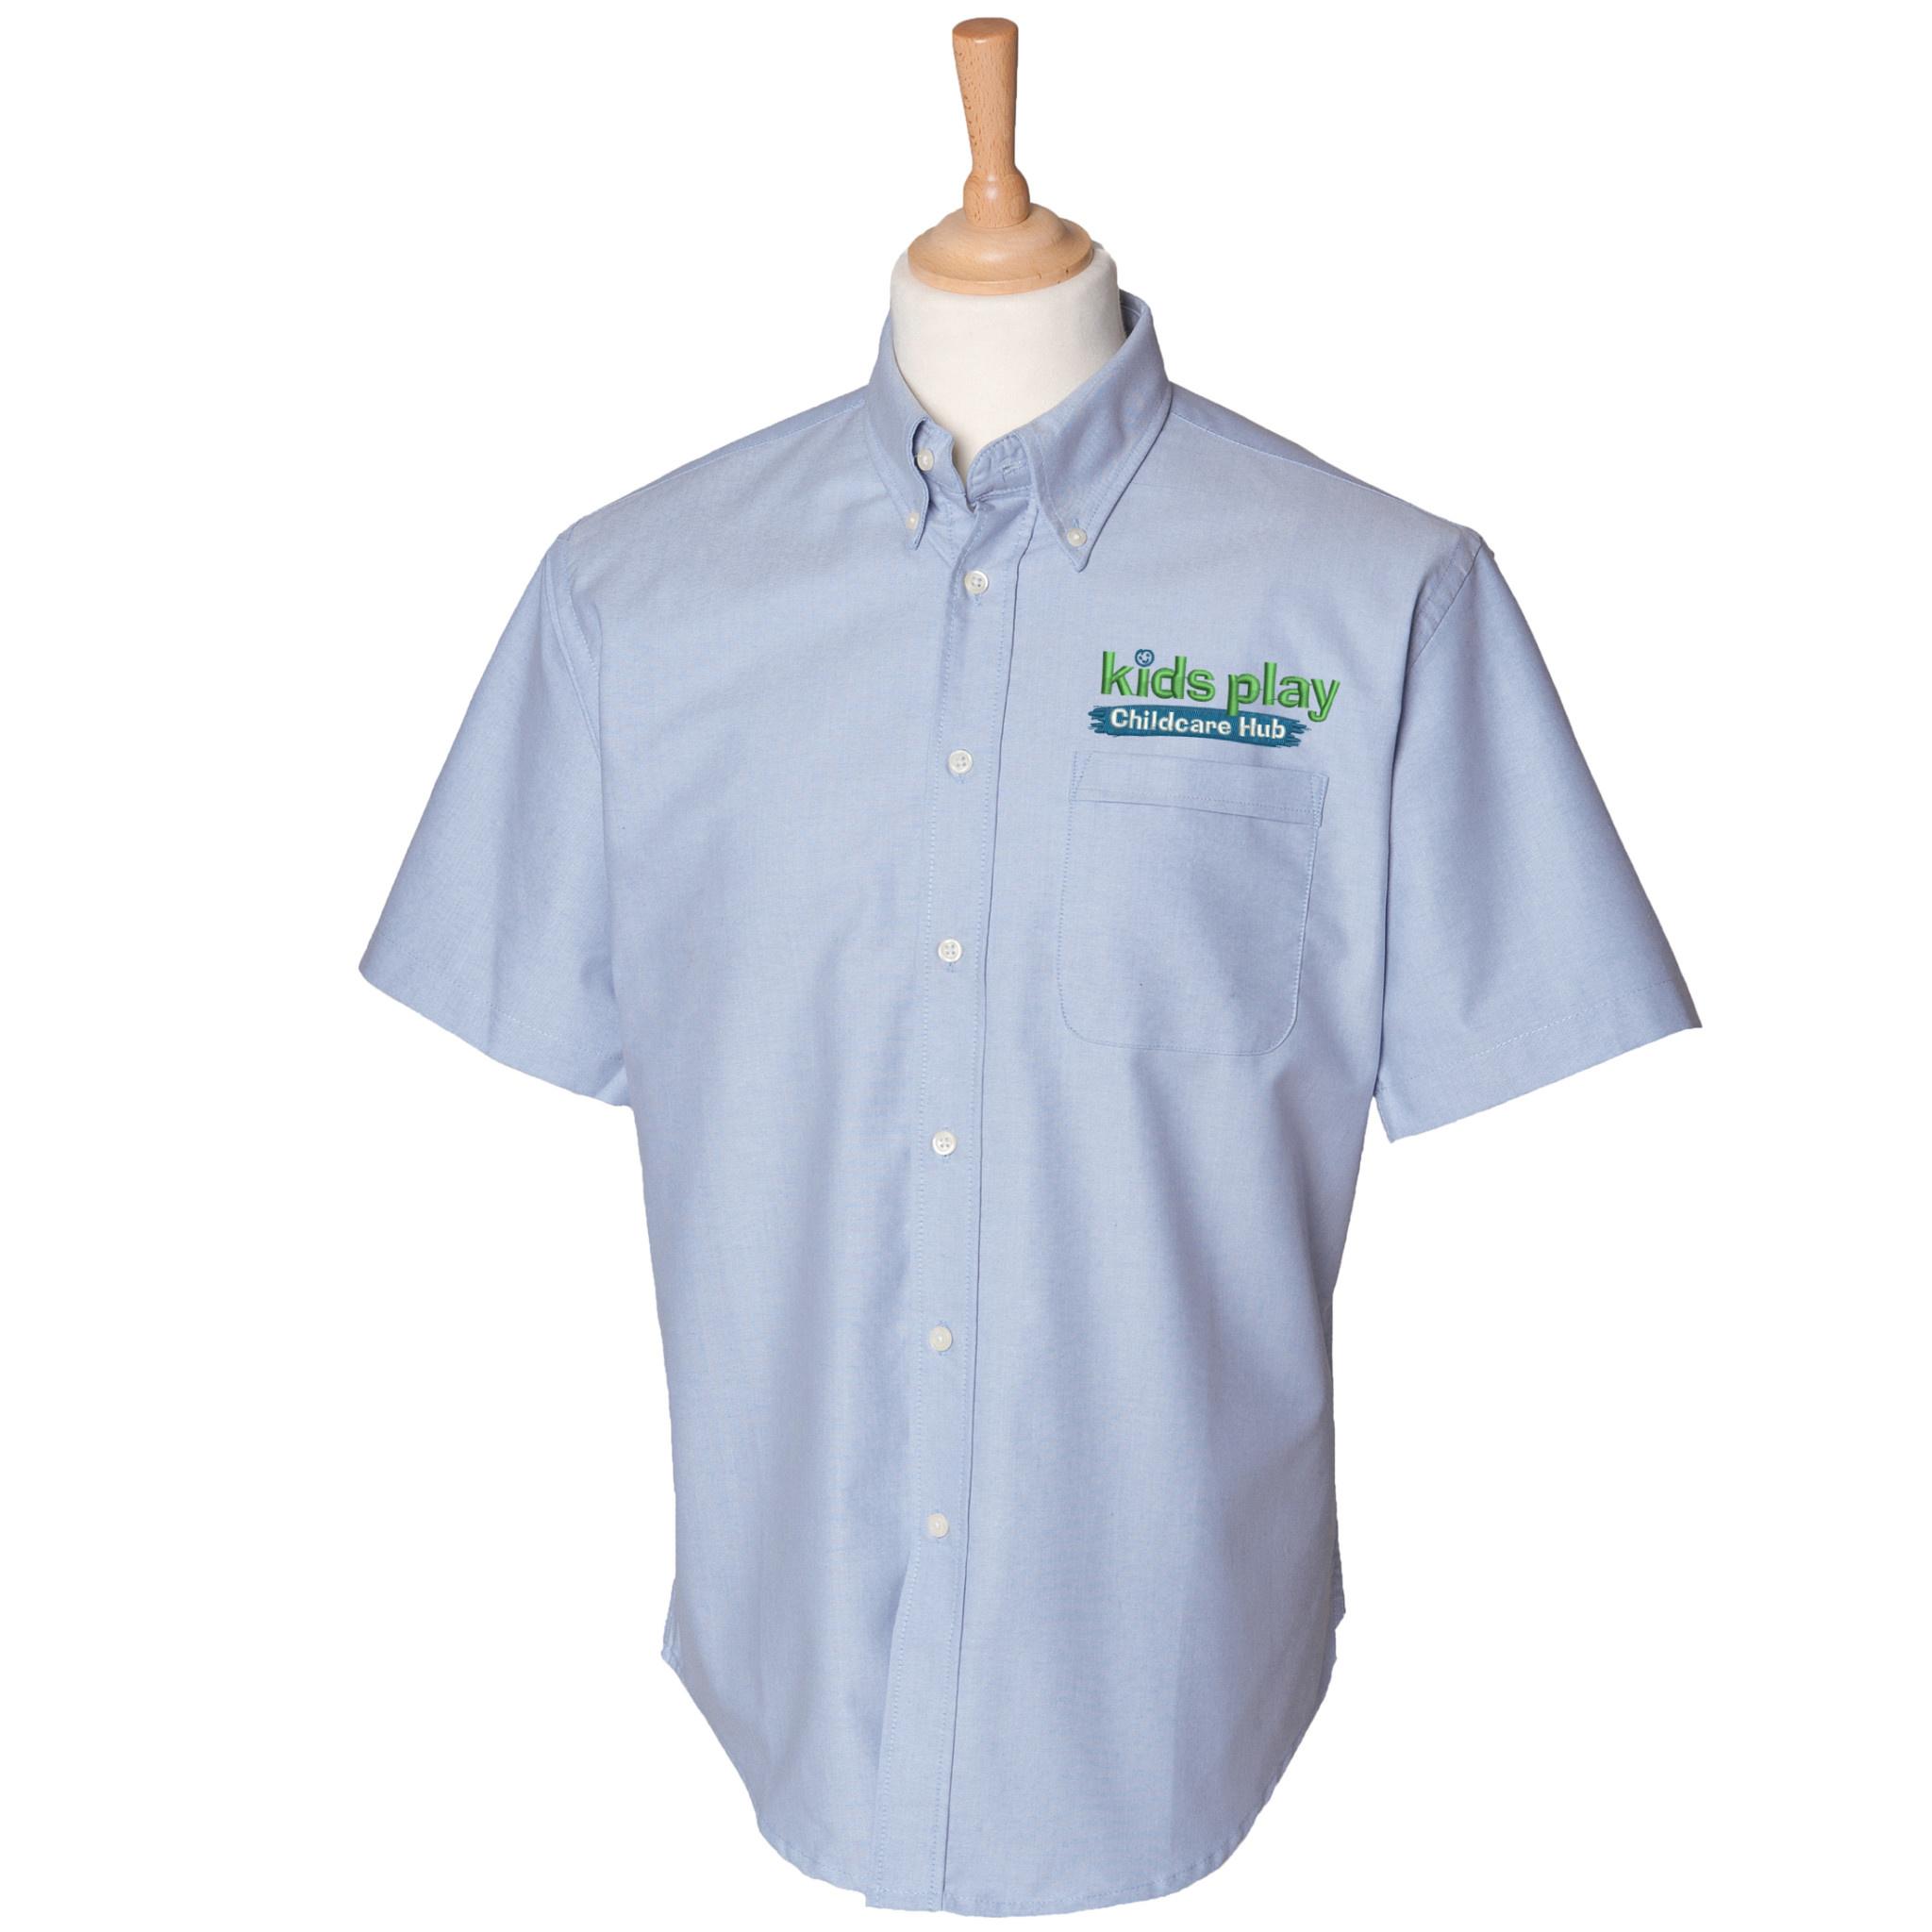 Premium Force Kids Play Mens Childcare Hub S/S Oxford Shirt